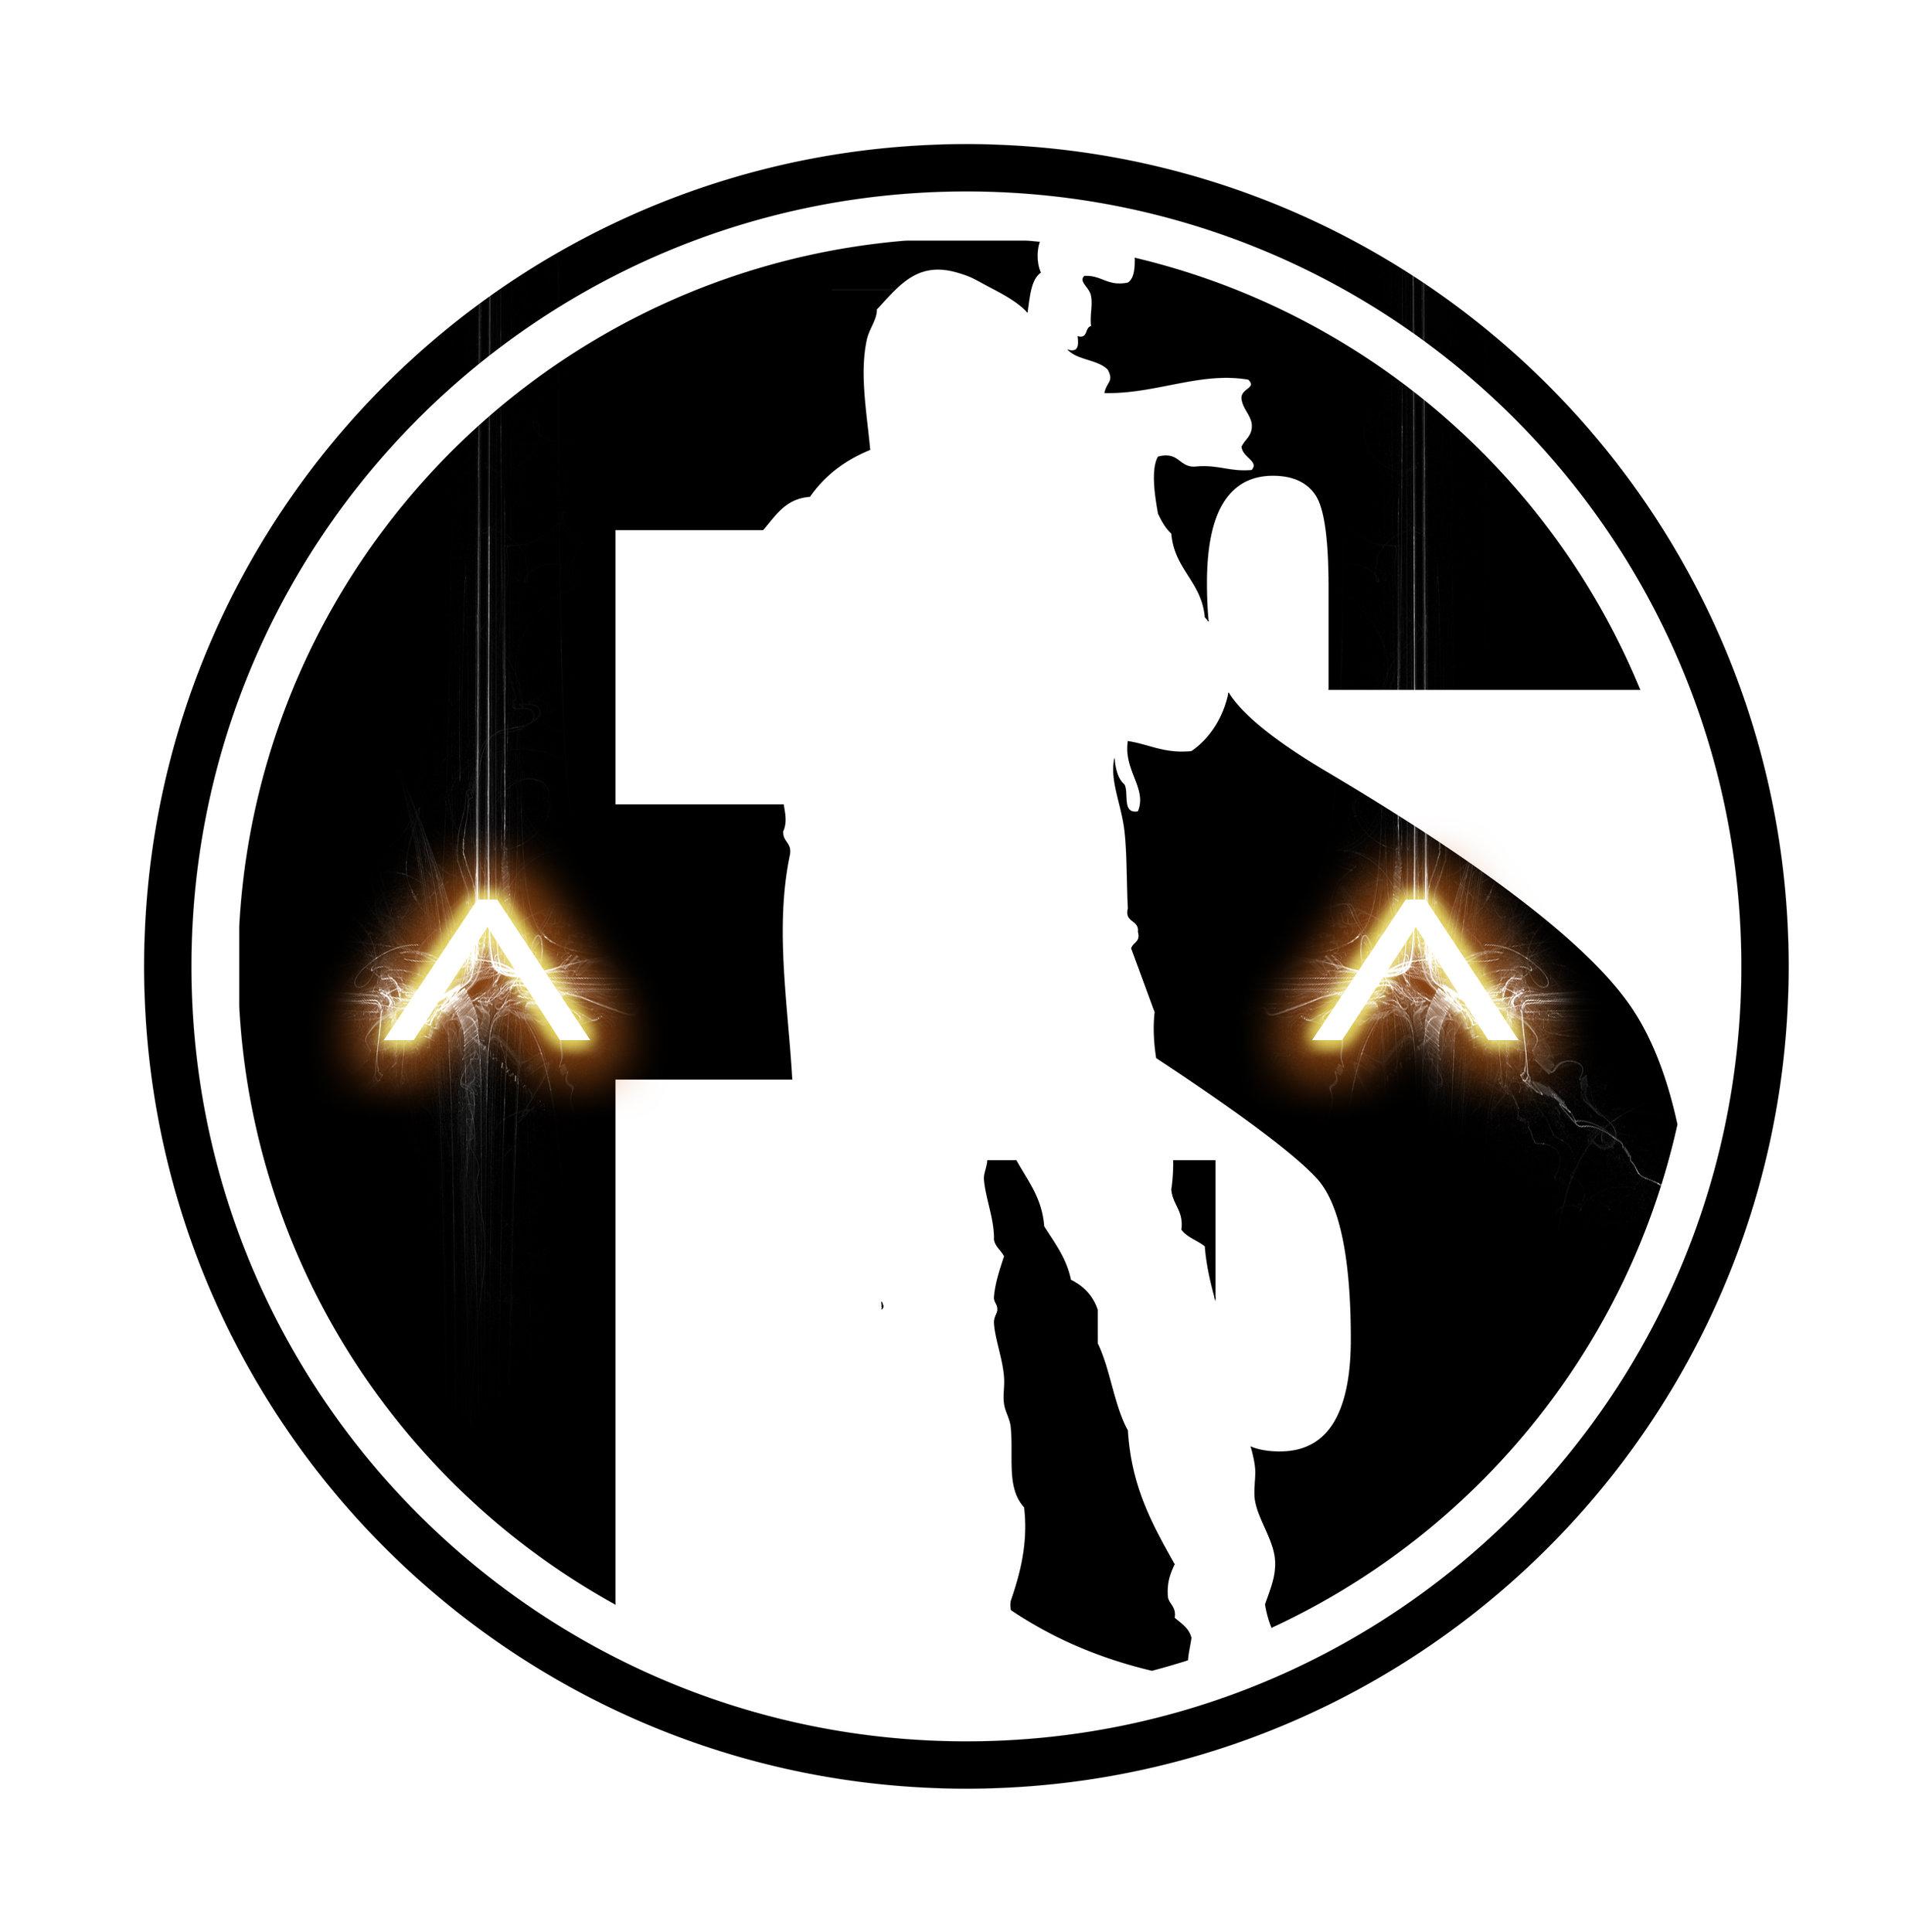 elementi design logo tinta piatta marchio